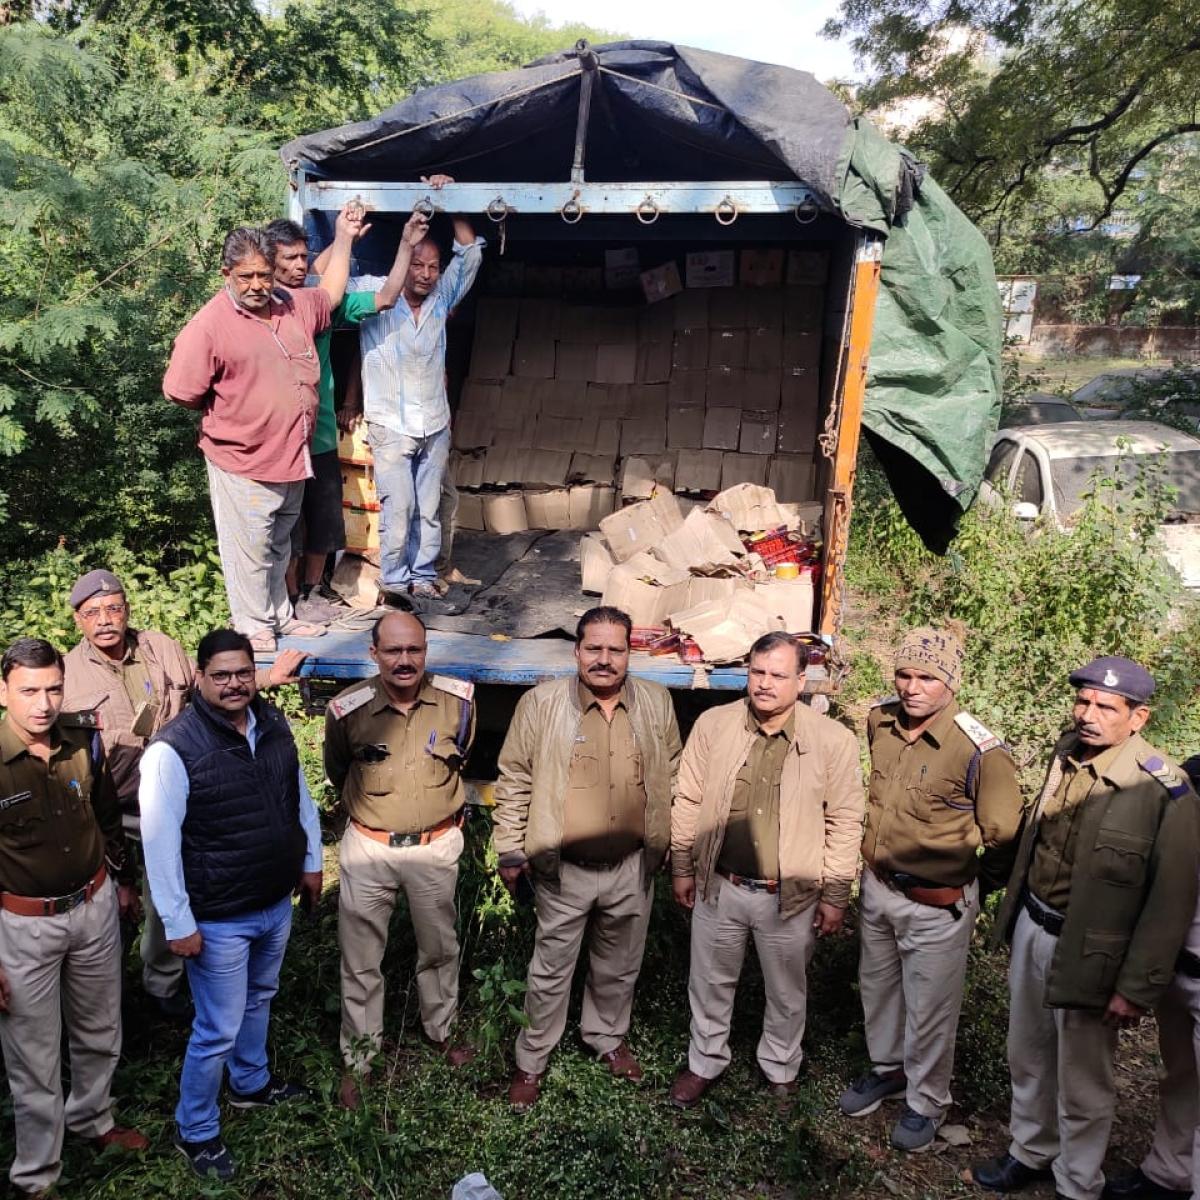 Mhow: Liquor worth Rs 55L seized